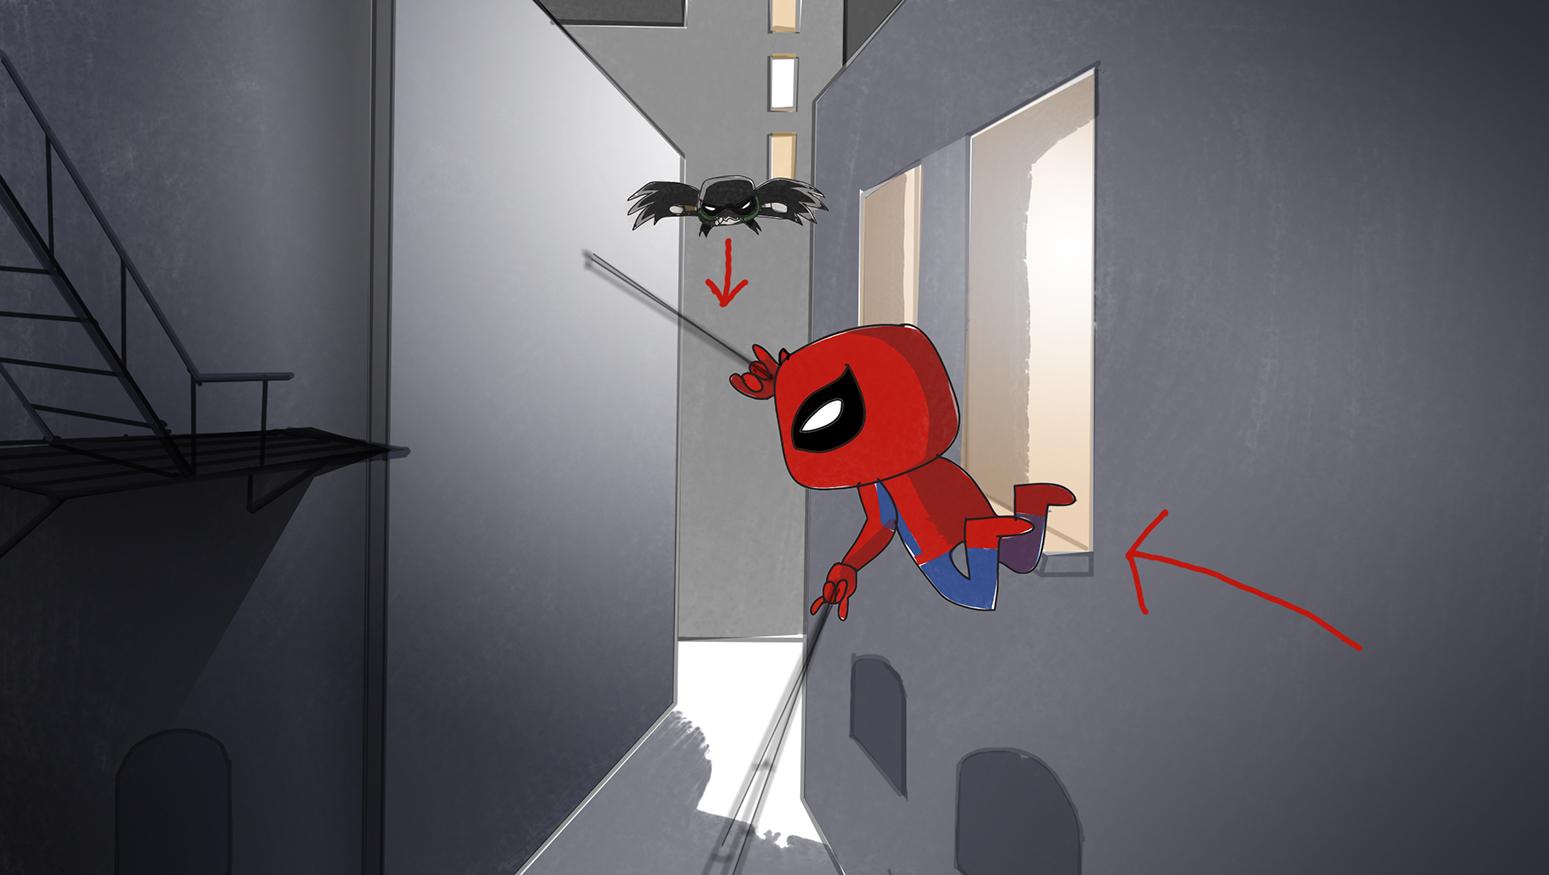 Spiderman_Vulture_12V02 copy.jpg